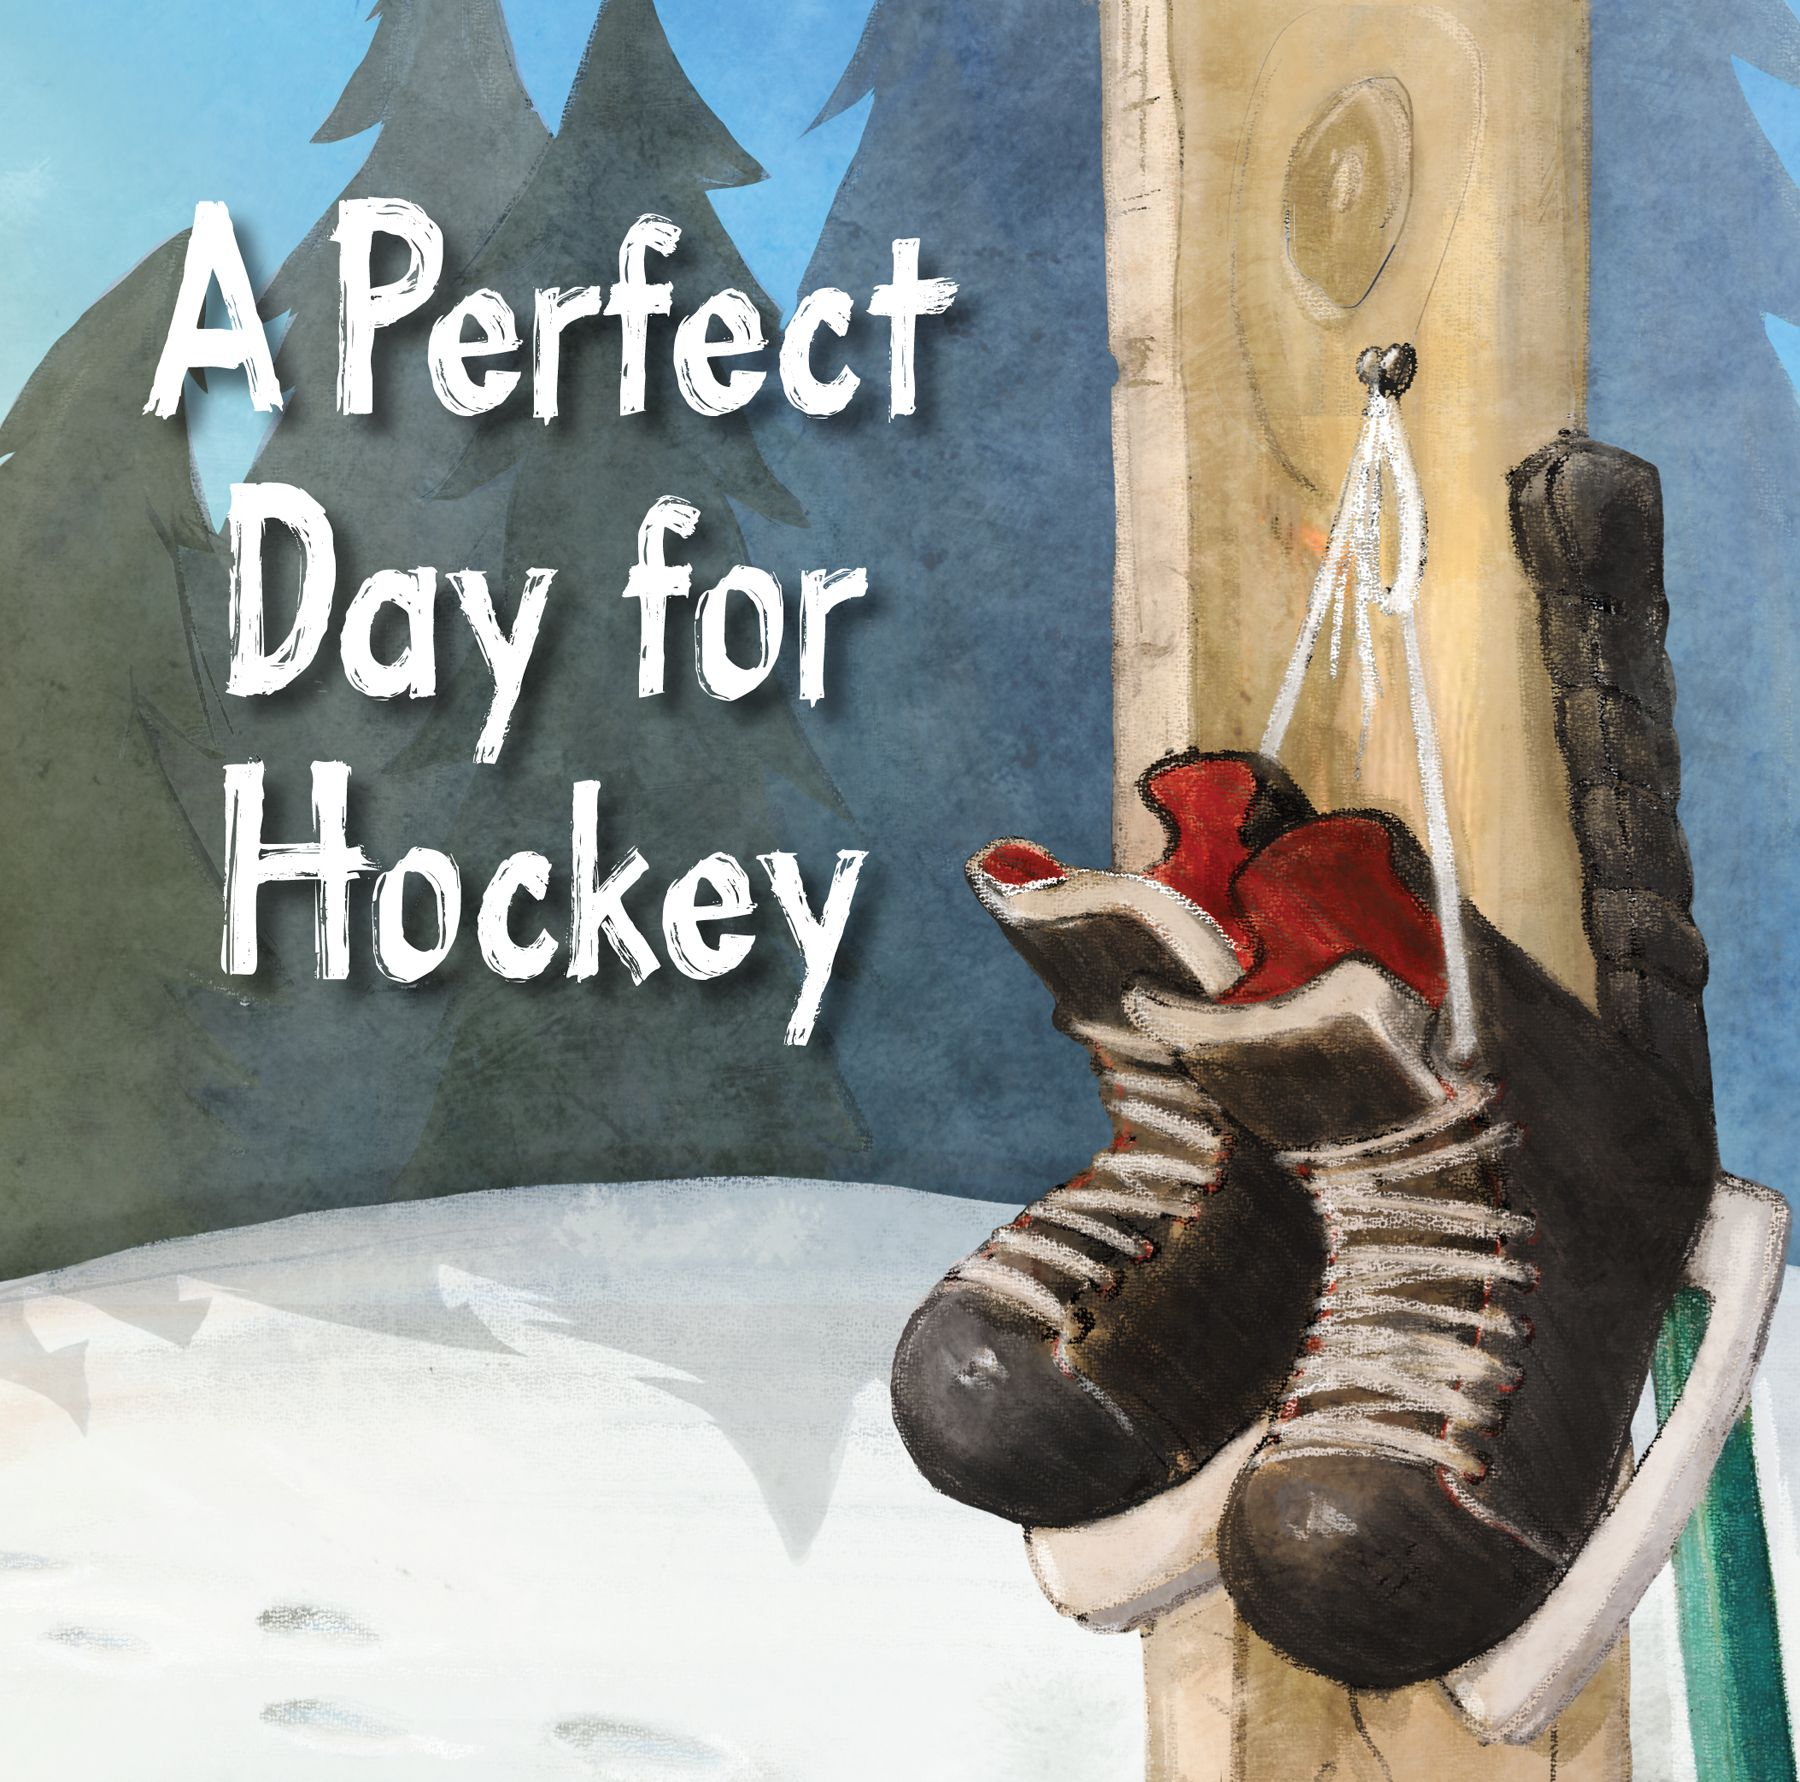 Books Andrew Podnieks A perfect day, Hockey, Books